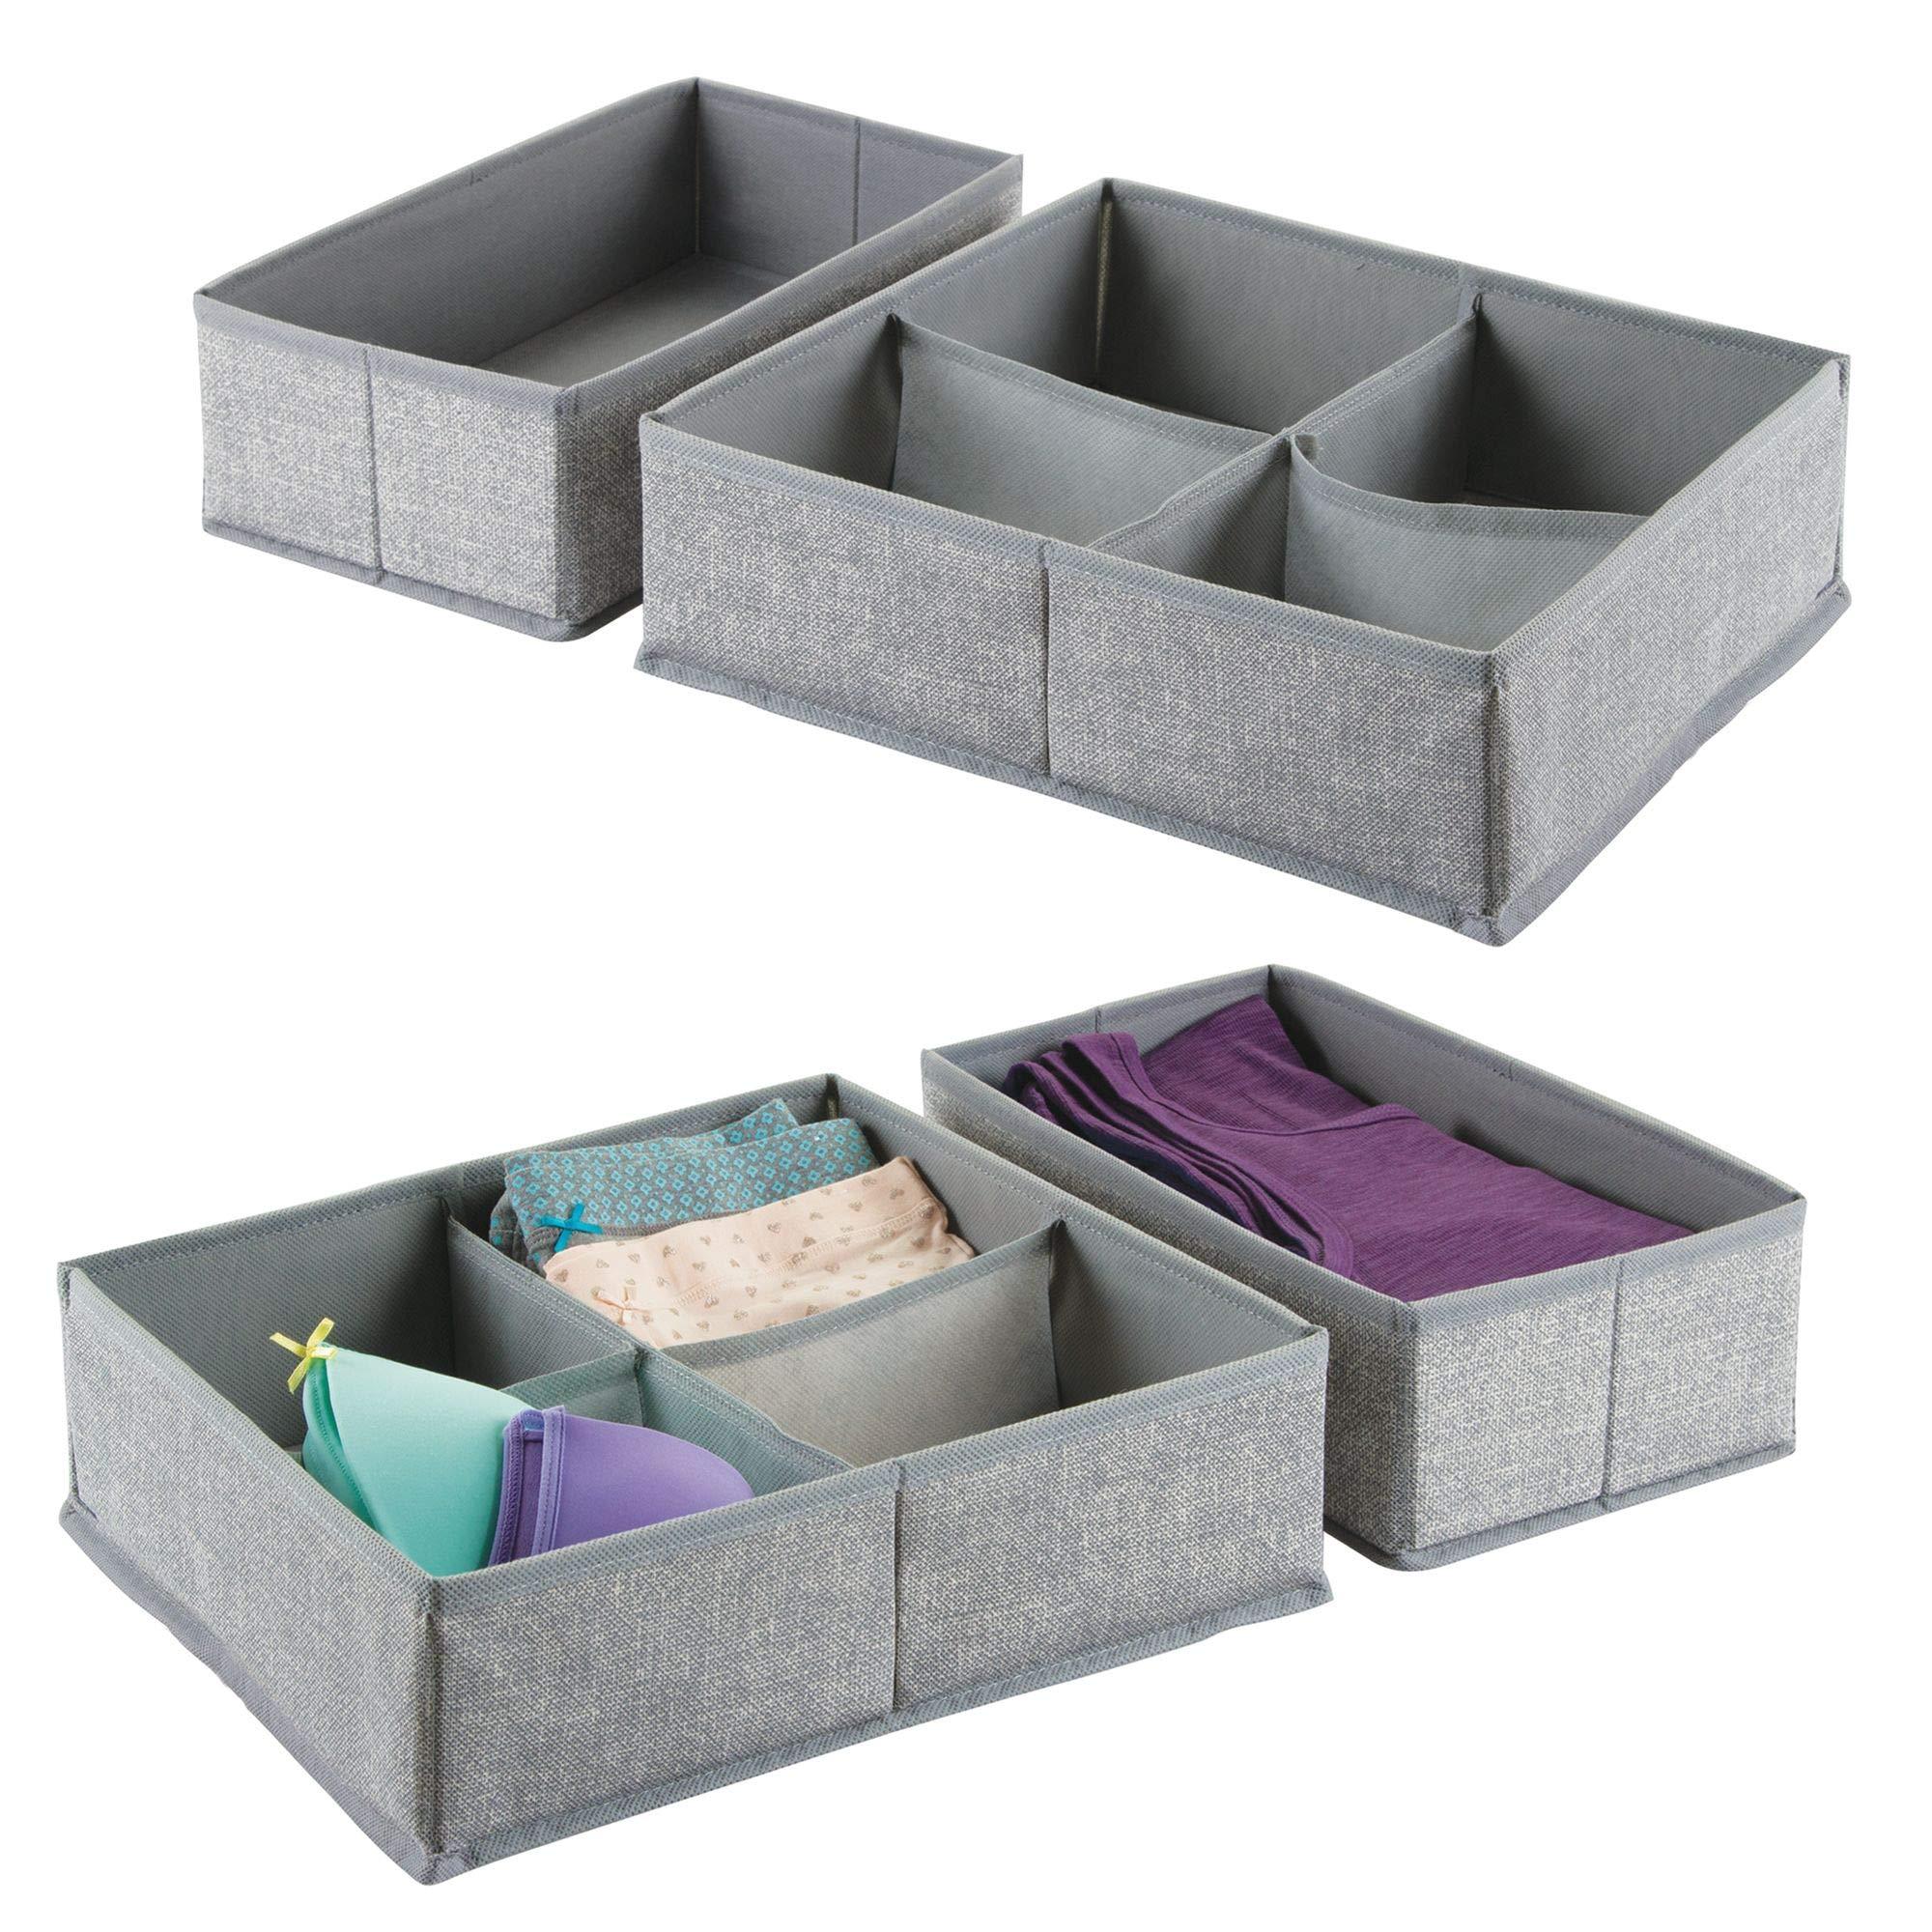 mDesign Soft Fabric Dresser Drawer and Closet Storage Organizer Bin Set for Bedroom Closet, Dresser Tops, Drawers � 4 Organizing Bins - Set of 4, Textured Print in Light Gray